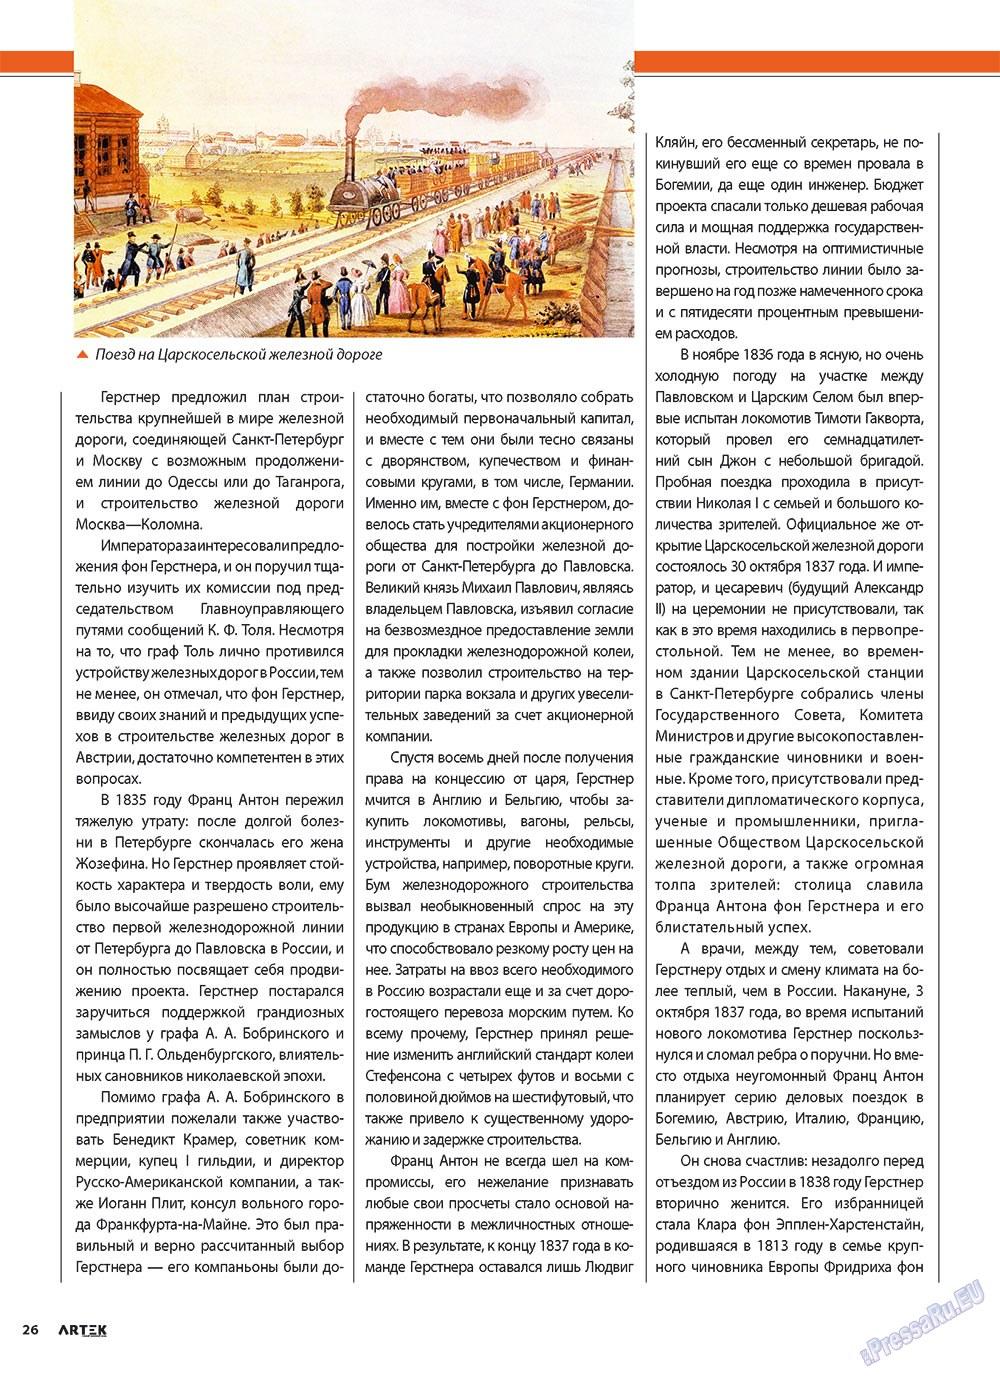 Артек (журнал). 2010 год, номер 3, стр. 28